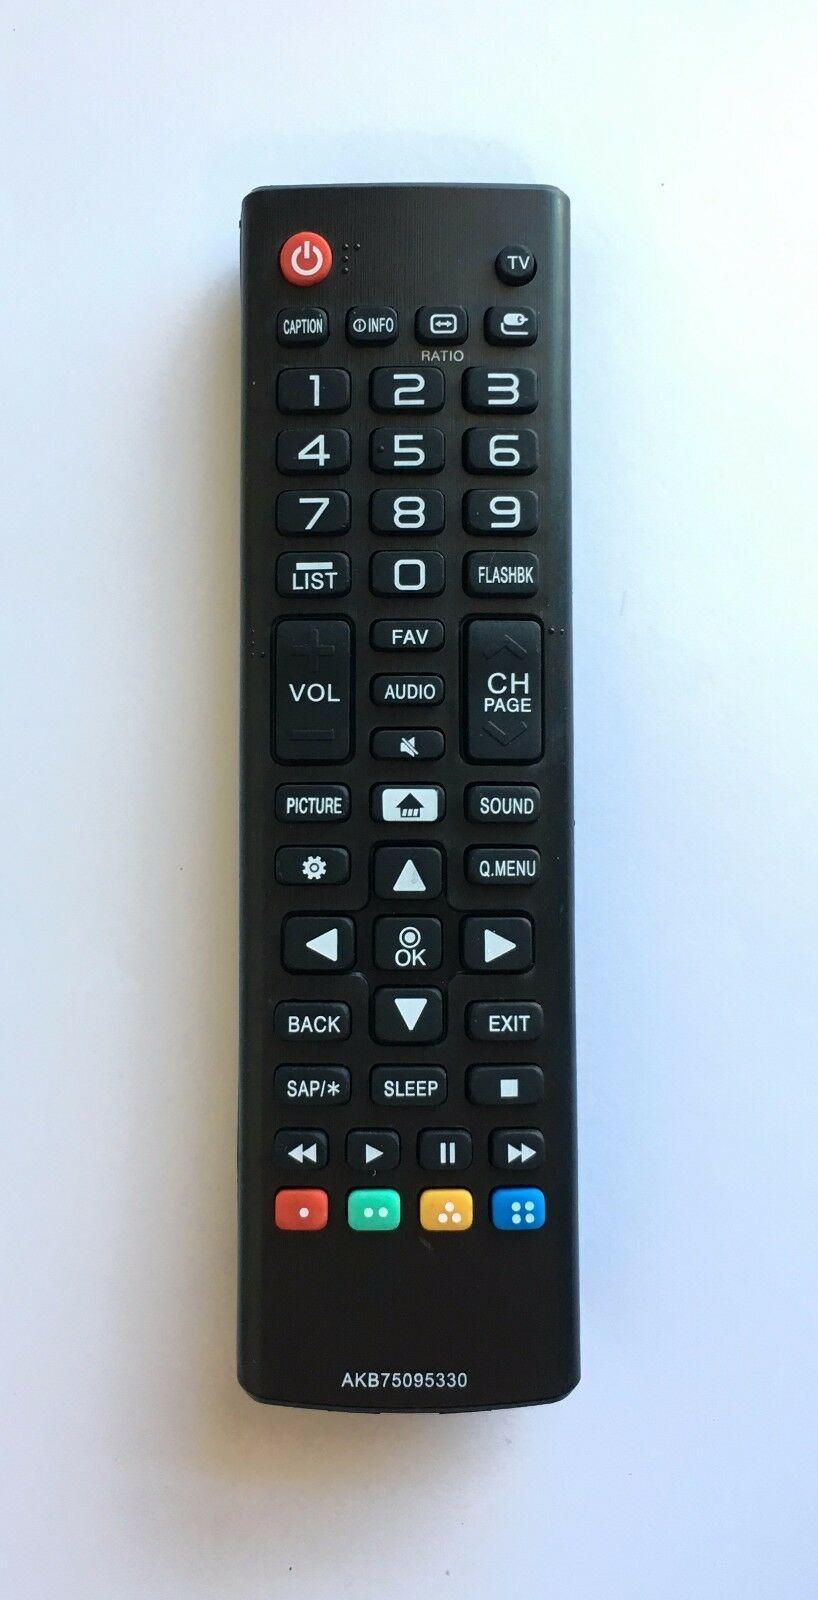 Lg Tv Remote Control Akb75095330